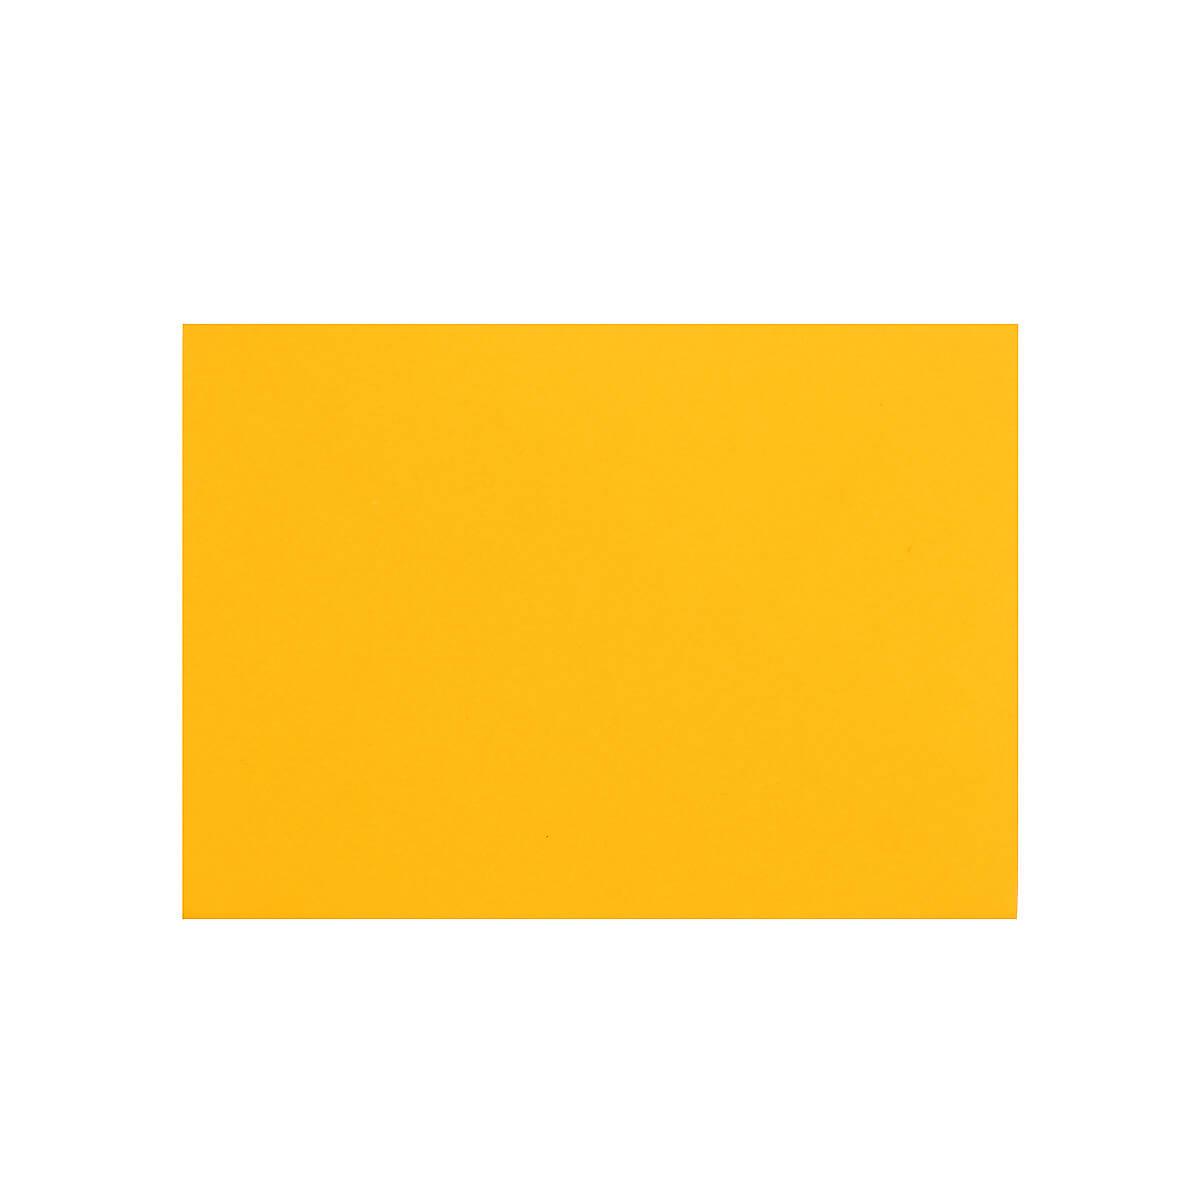 SUNFLOWER YELLOW 125 x 175mm ENVELOPES